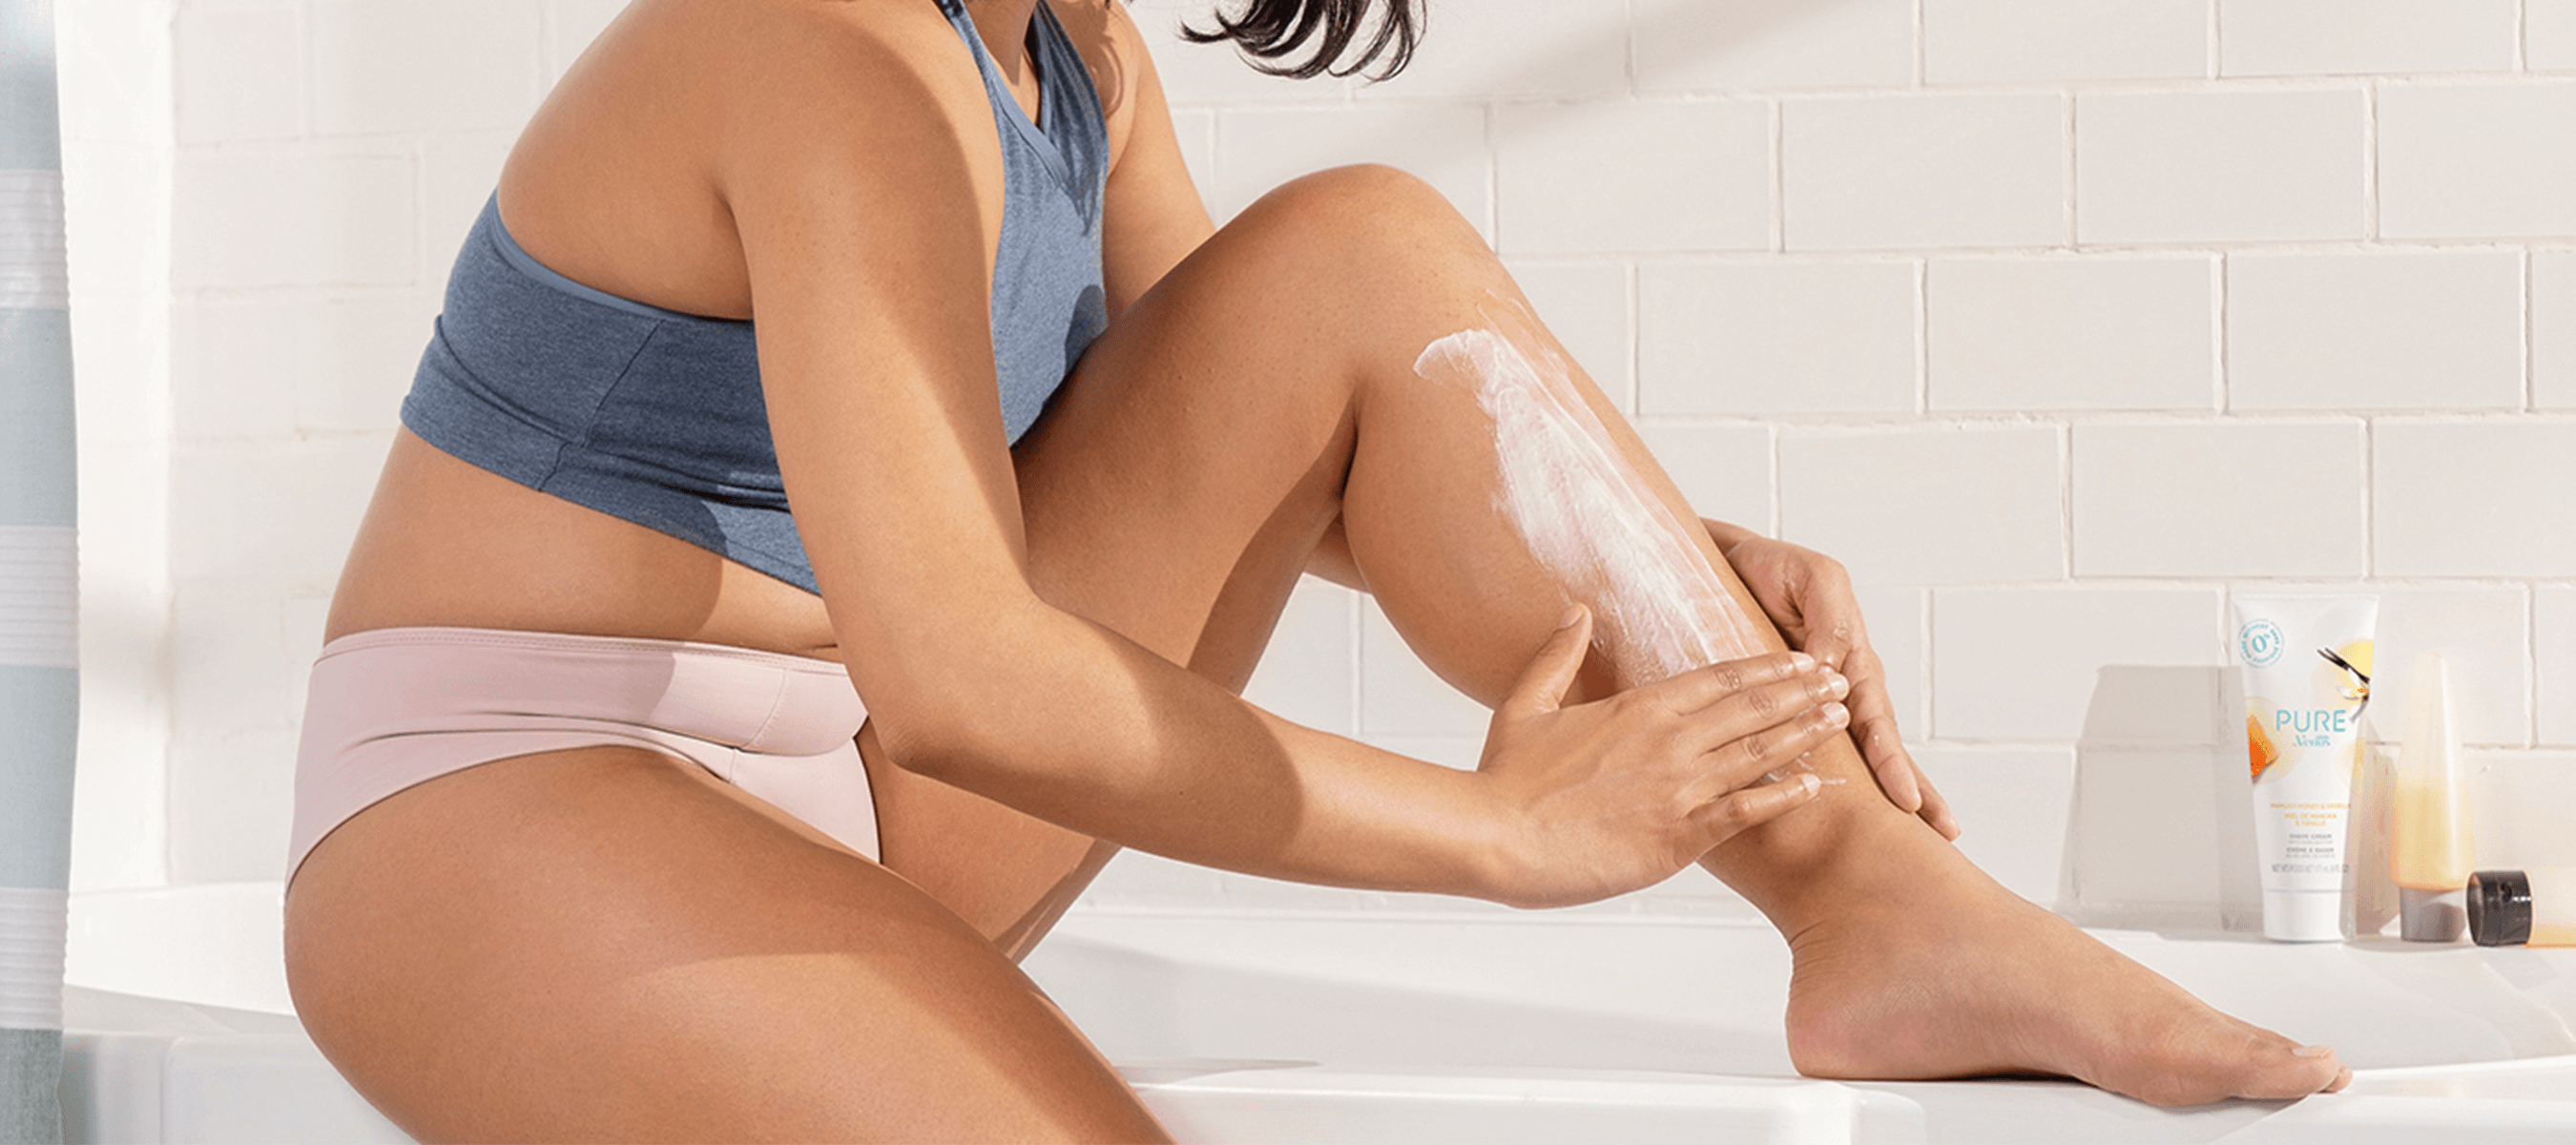 Woman applying shaving cream to leg while sitting in a bathtub.